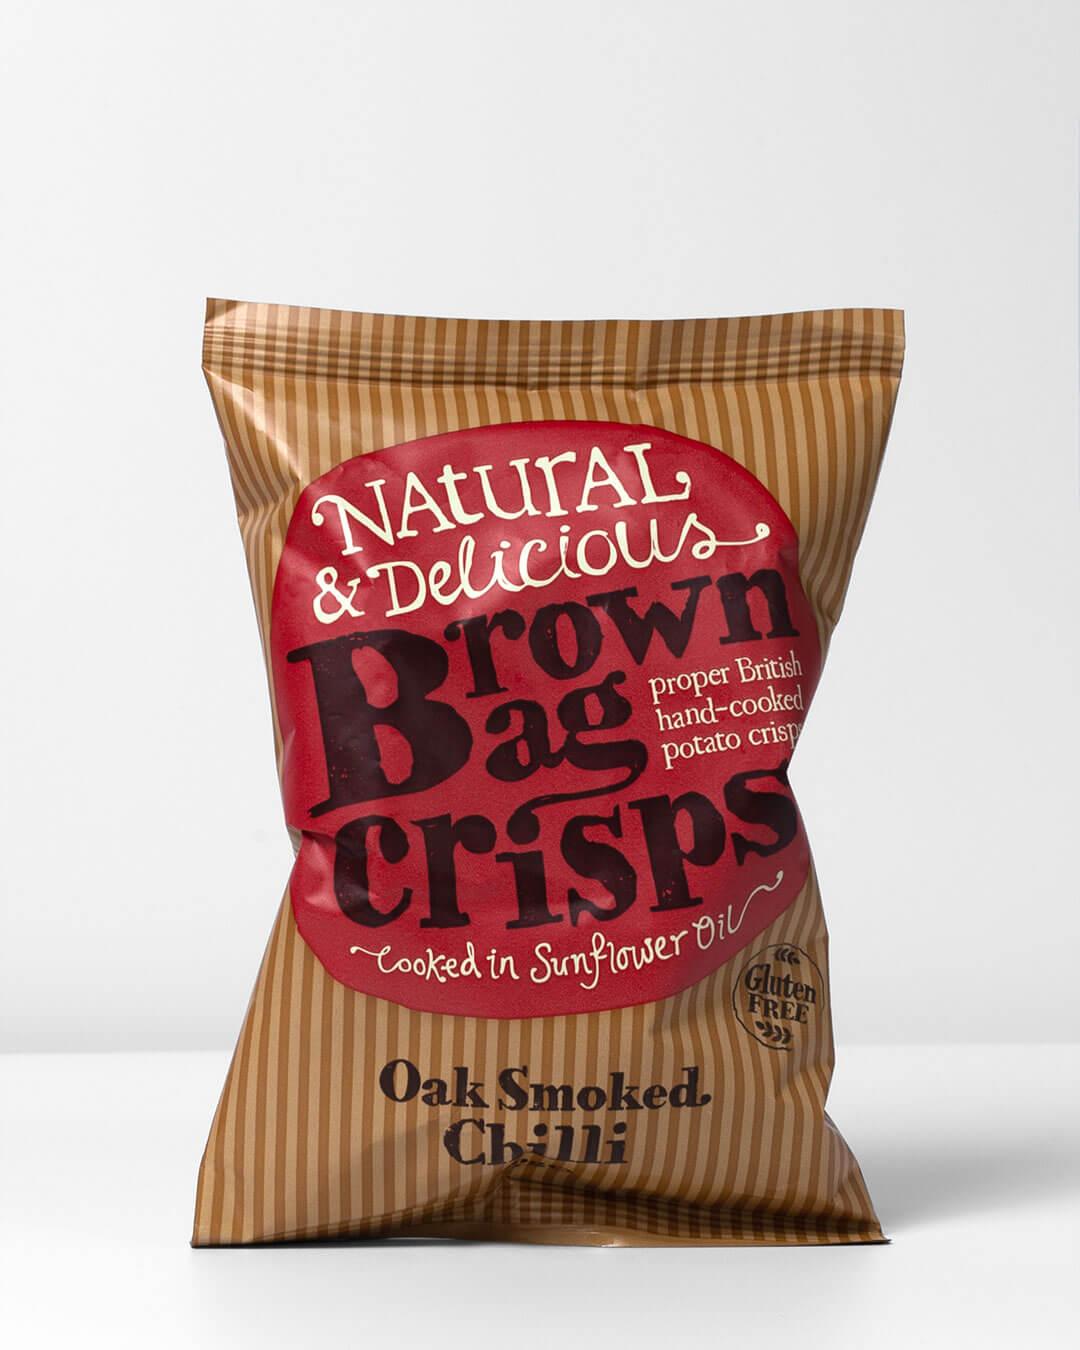 Brown Bag Sweet Chilli Crisps